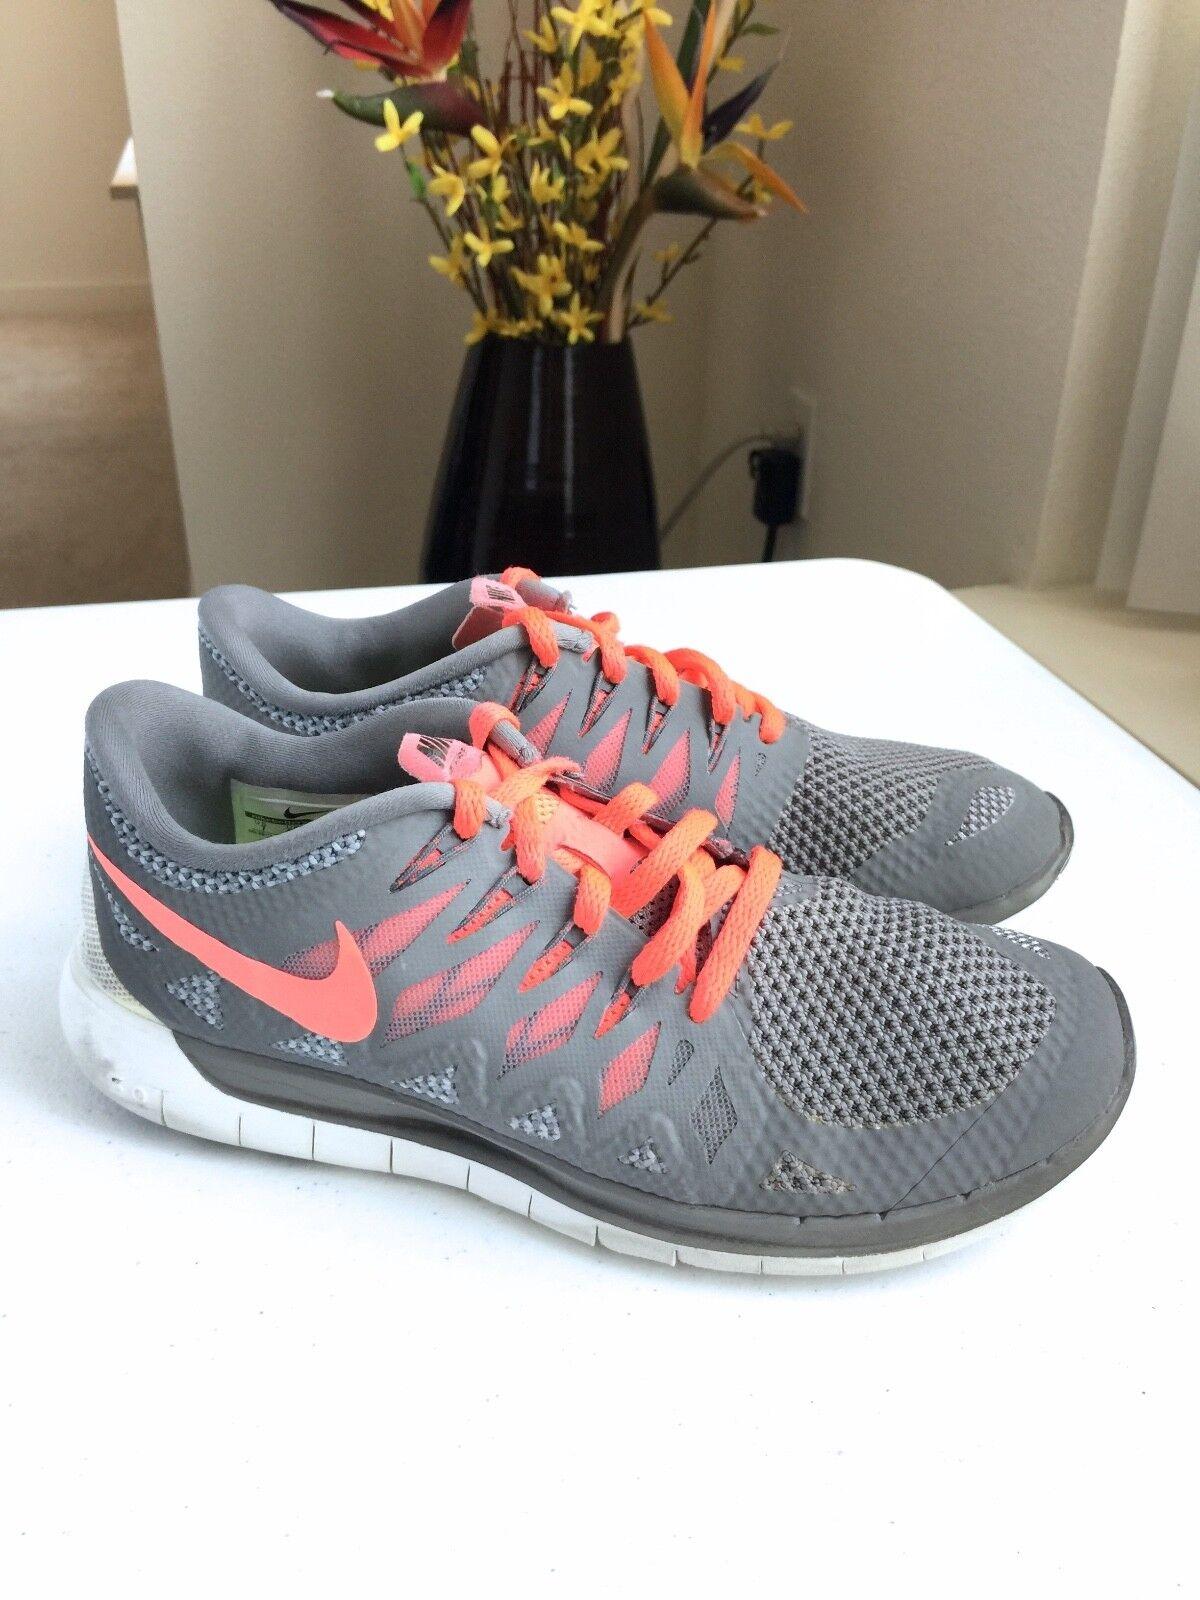 607feed2c5 0 0 0 7 Free Us Shoes Shoes Shoes 1854bd 5 Size Women's Nike Running qZ4ttf